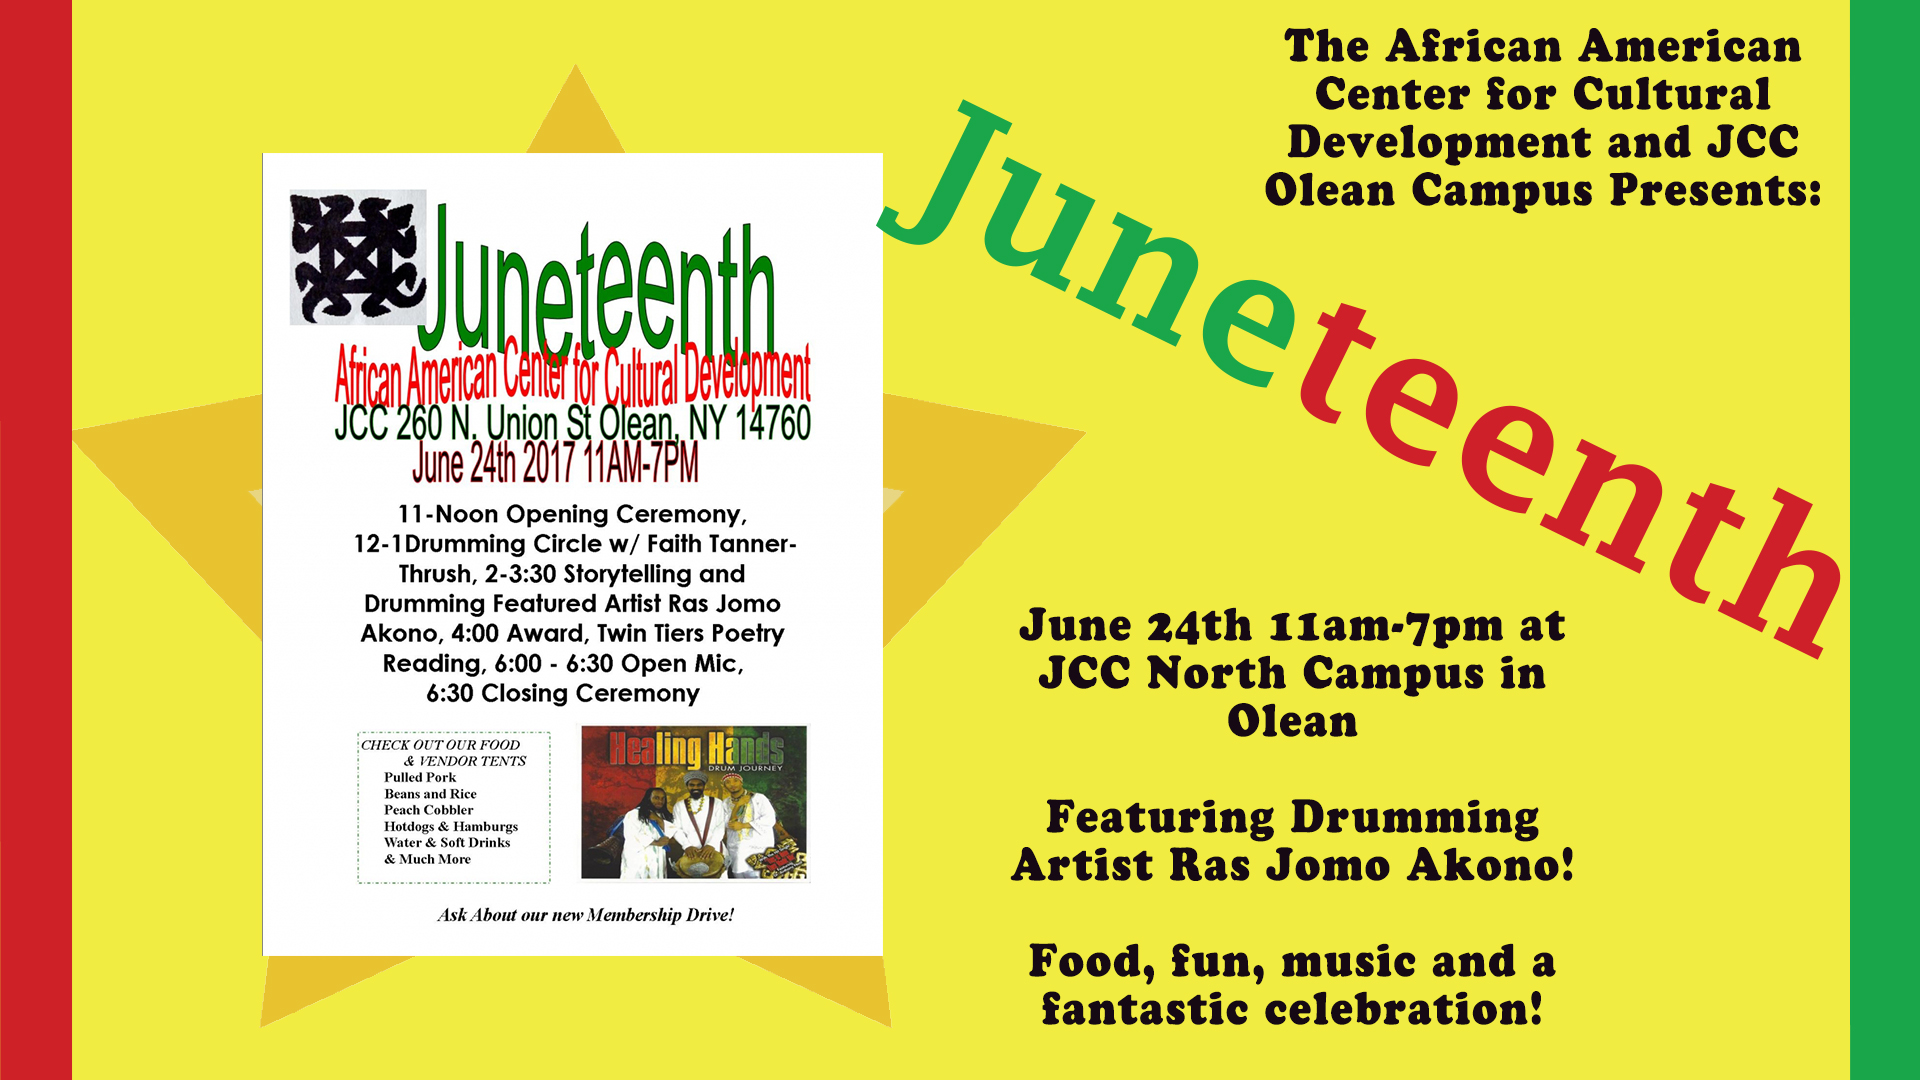 Juneteenth in Olean